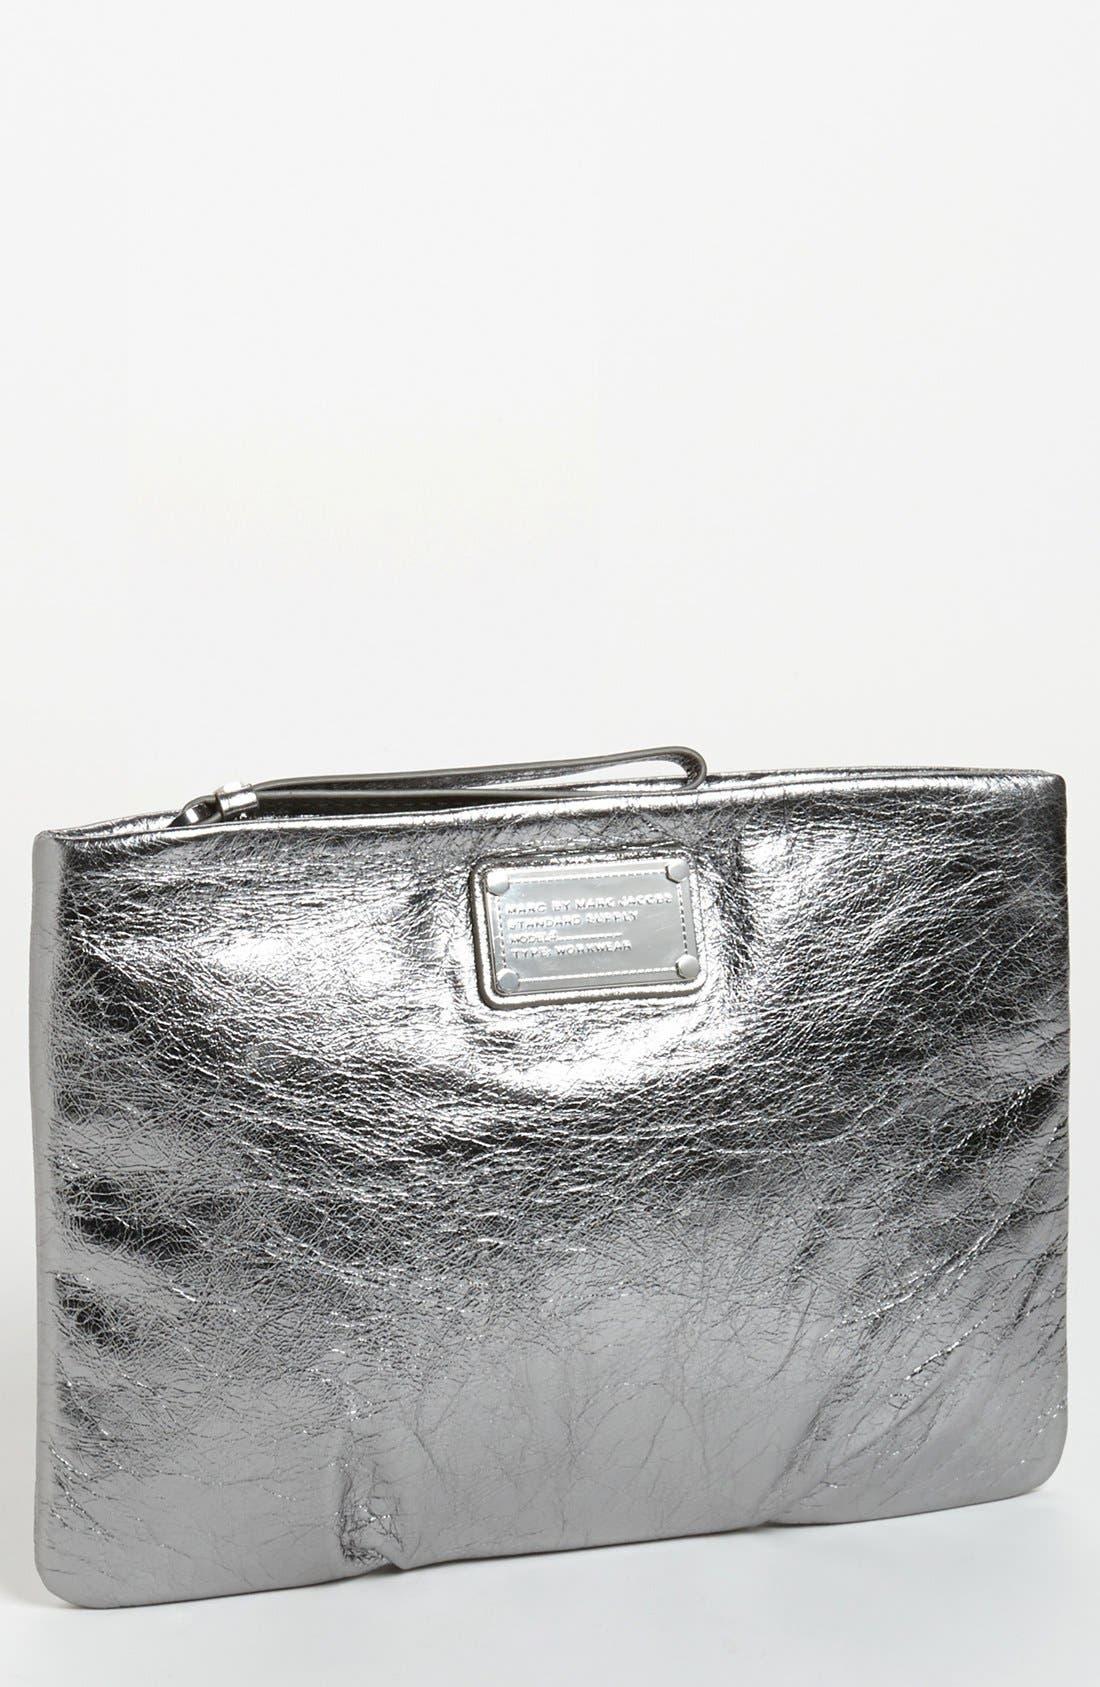 Main Image - MARC BY MARC JACOBS 'Classic Q' Tablet Wristlet